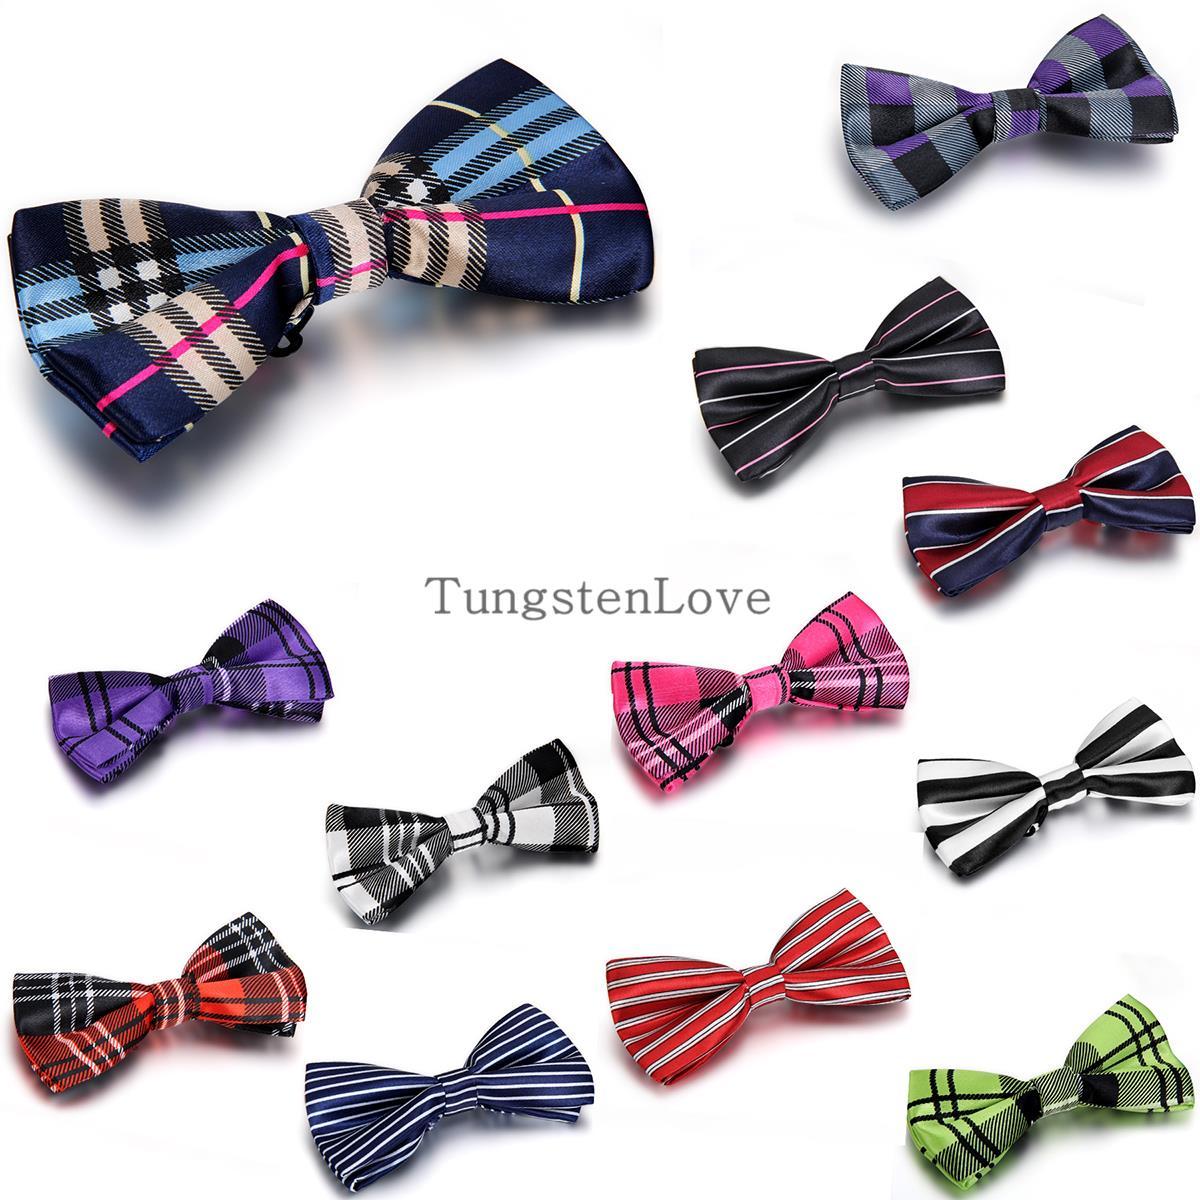 2015 Brand NEW Men's Imitation Silk Tuxedo Adjustable Striped Neck Bowtie Bow Ties for Men wedding party necktie butterfly